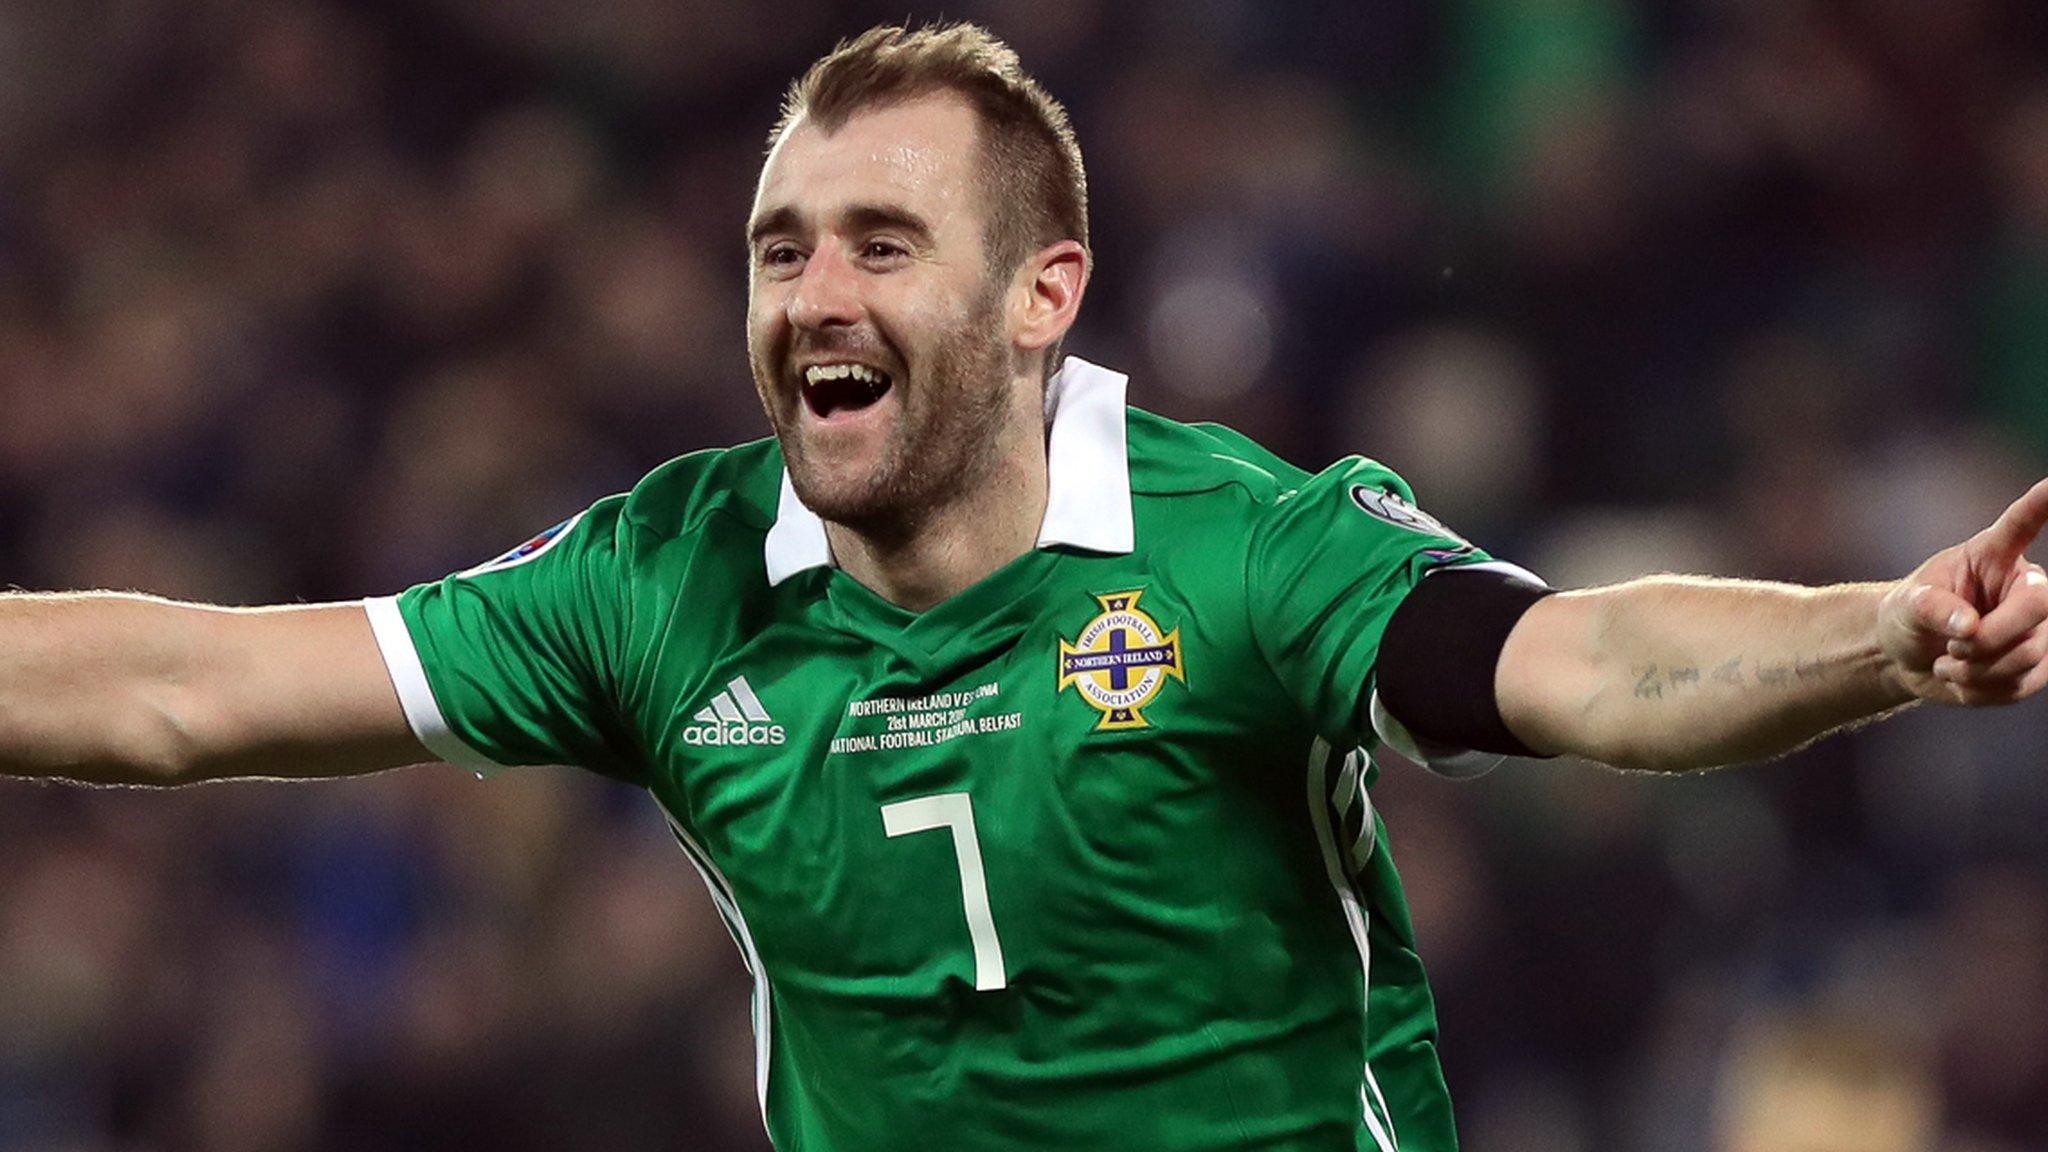 Northern Ireland defeat Estonia in Euro 2020 opener